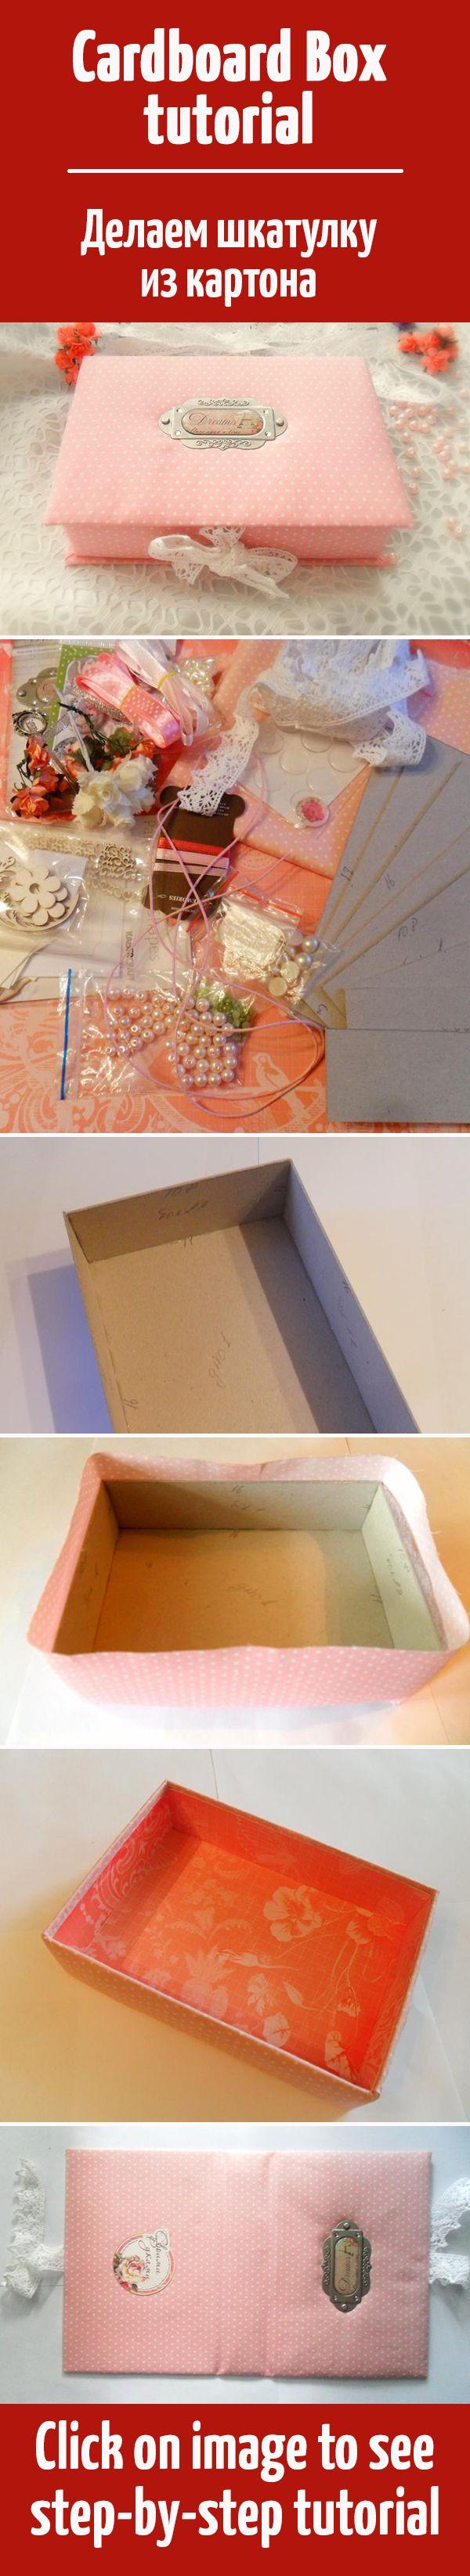 Делаем шкатулку из картона / Cardboards box tutorial #МК #мастеркласс #tutorial #DIY #inspiration